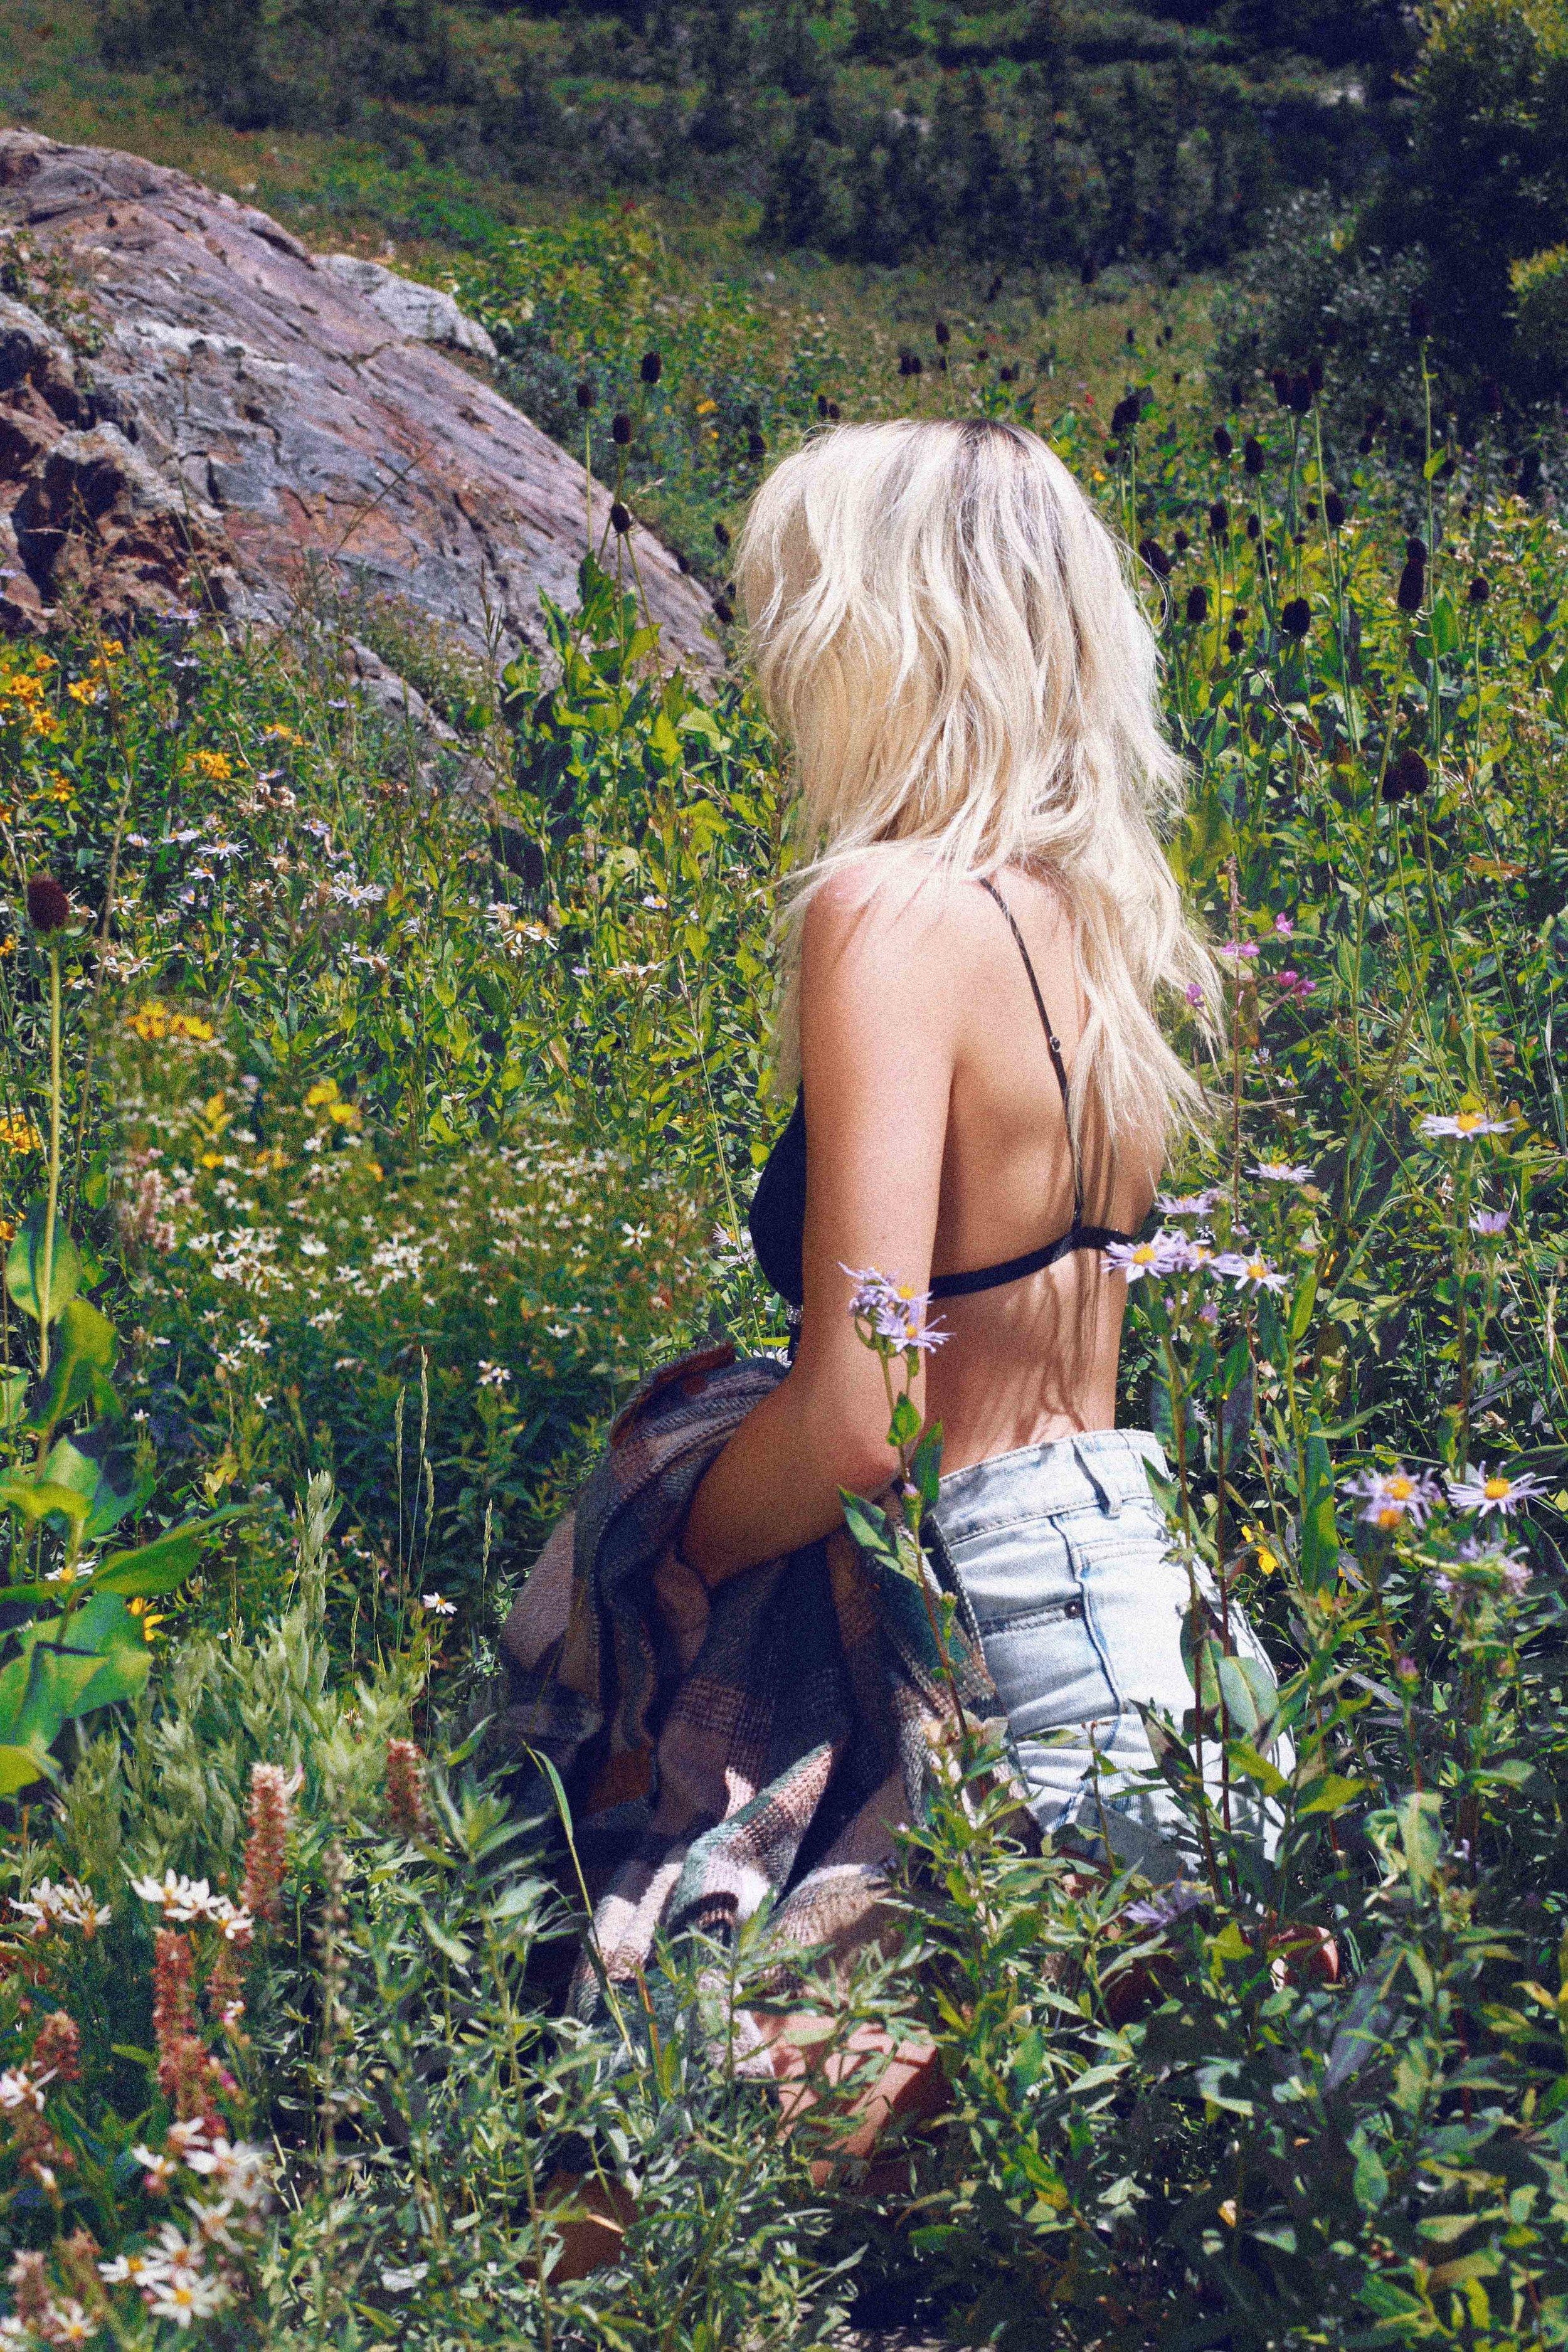 FLOWER FIELDS OF UTAH - Fashion Photo Shoot Story shot in Albion Basin SLC by Alyssa Risley - IG @alyssarisley